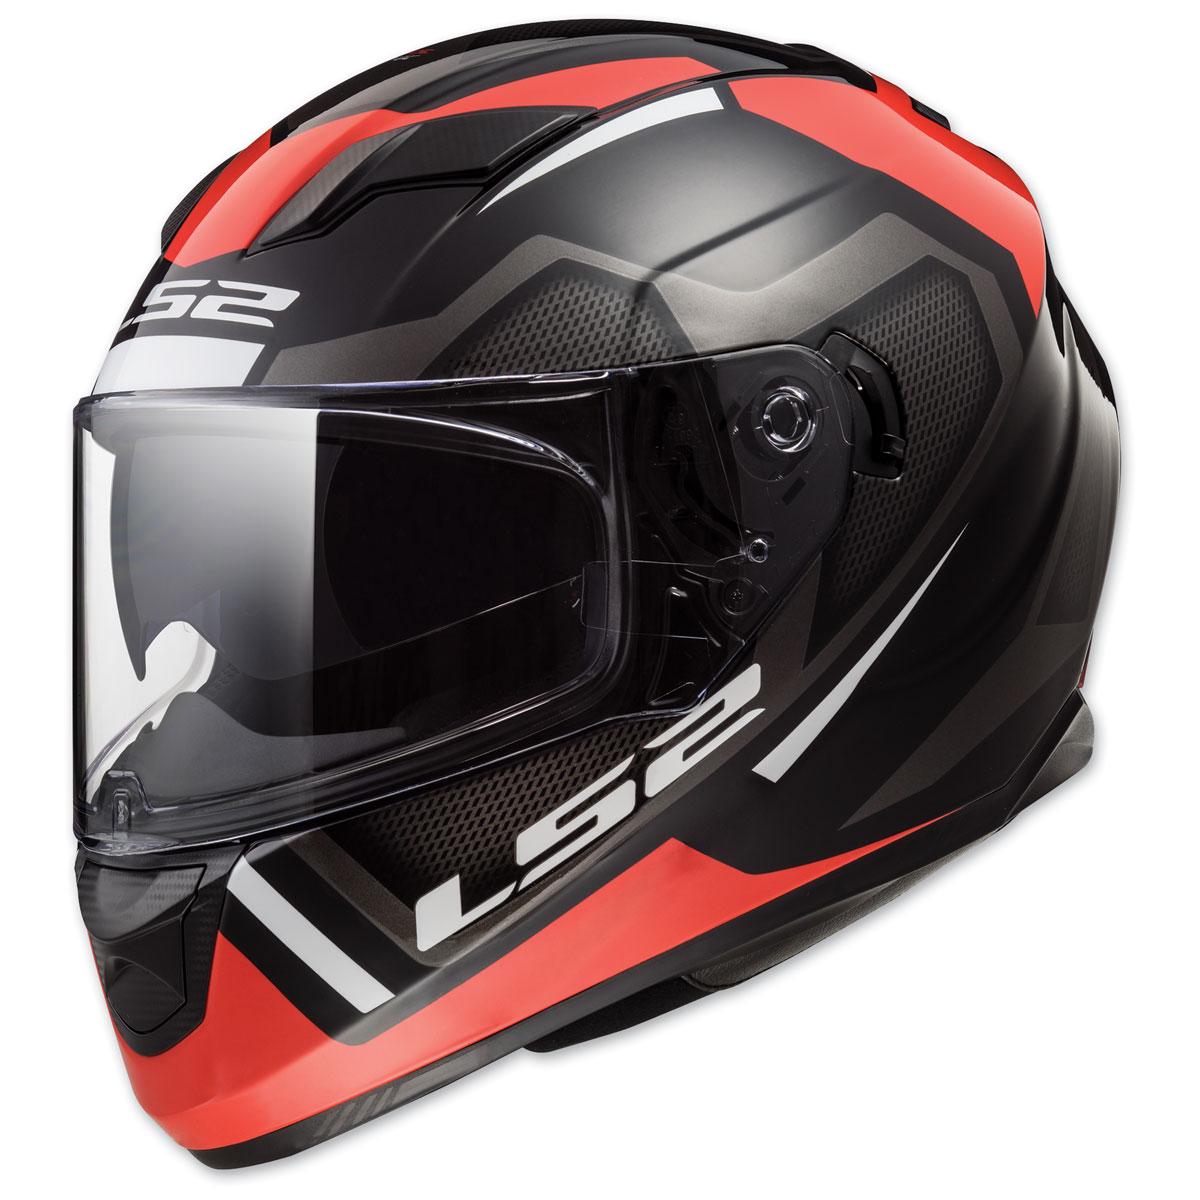 358fd86c617 LS2 Stream Axis Matte Red Full Face Helmets - 328-1621 | JPCycles.com